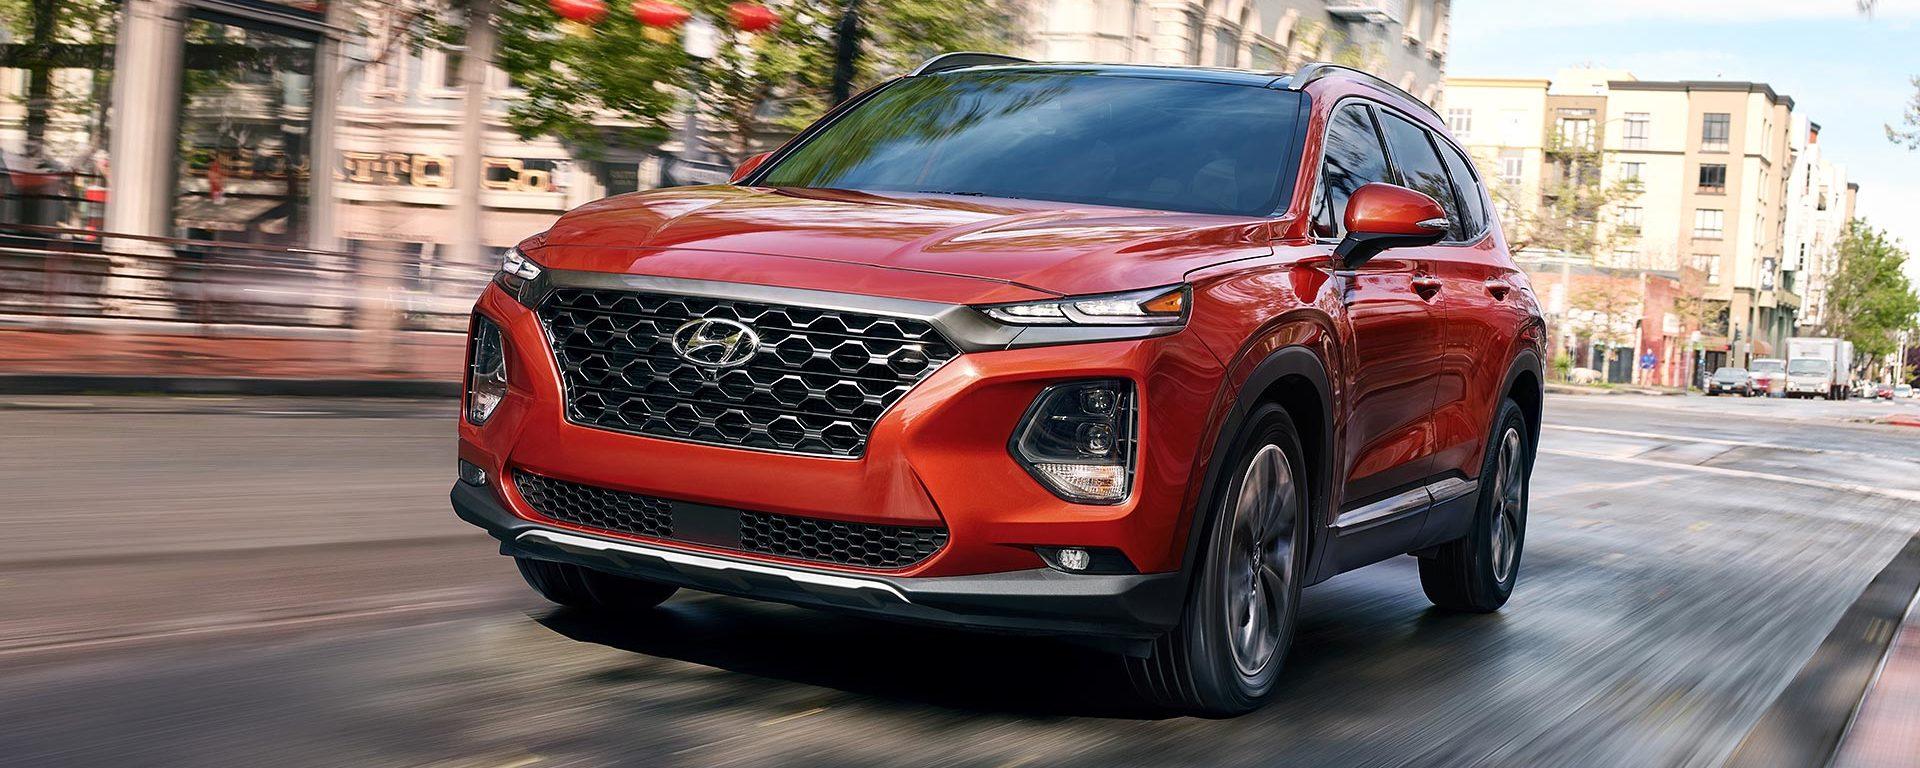 2020 Hyundai Santa Fe Leasing near Manassas, VA